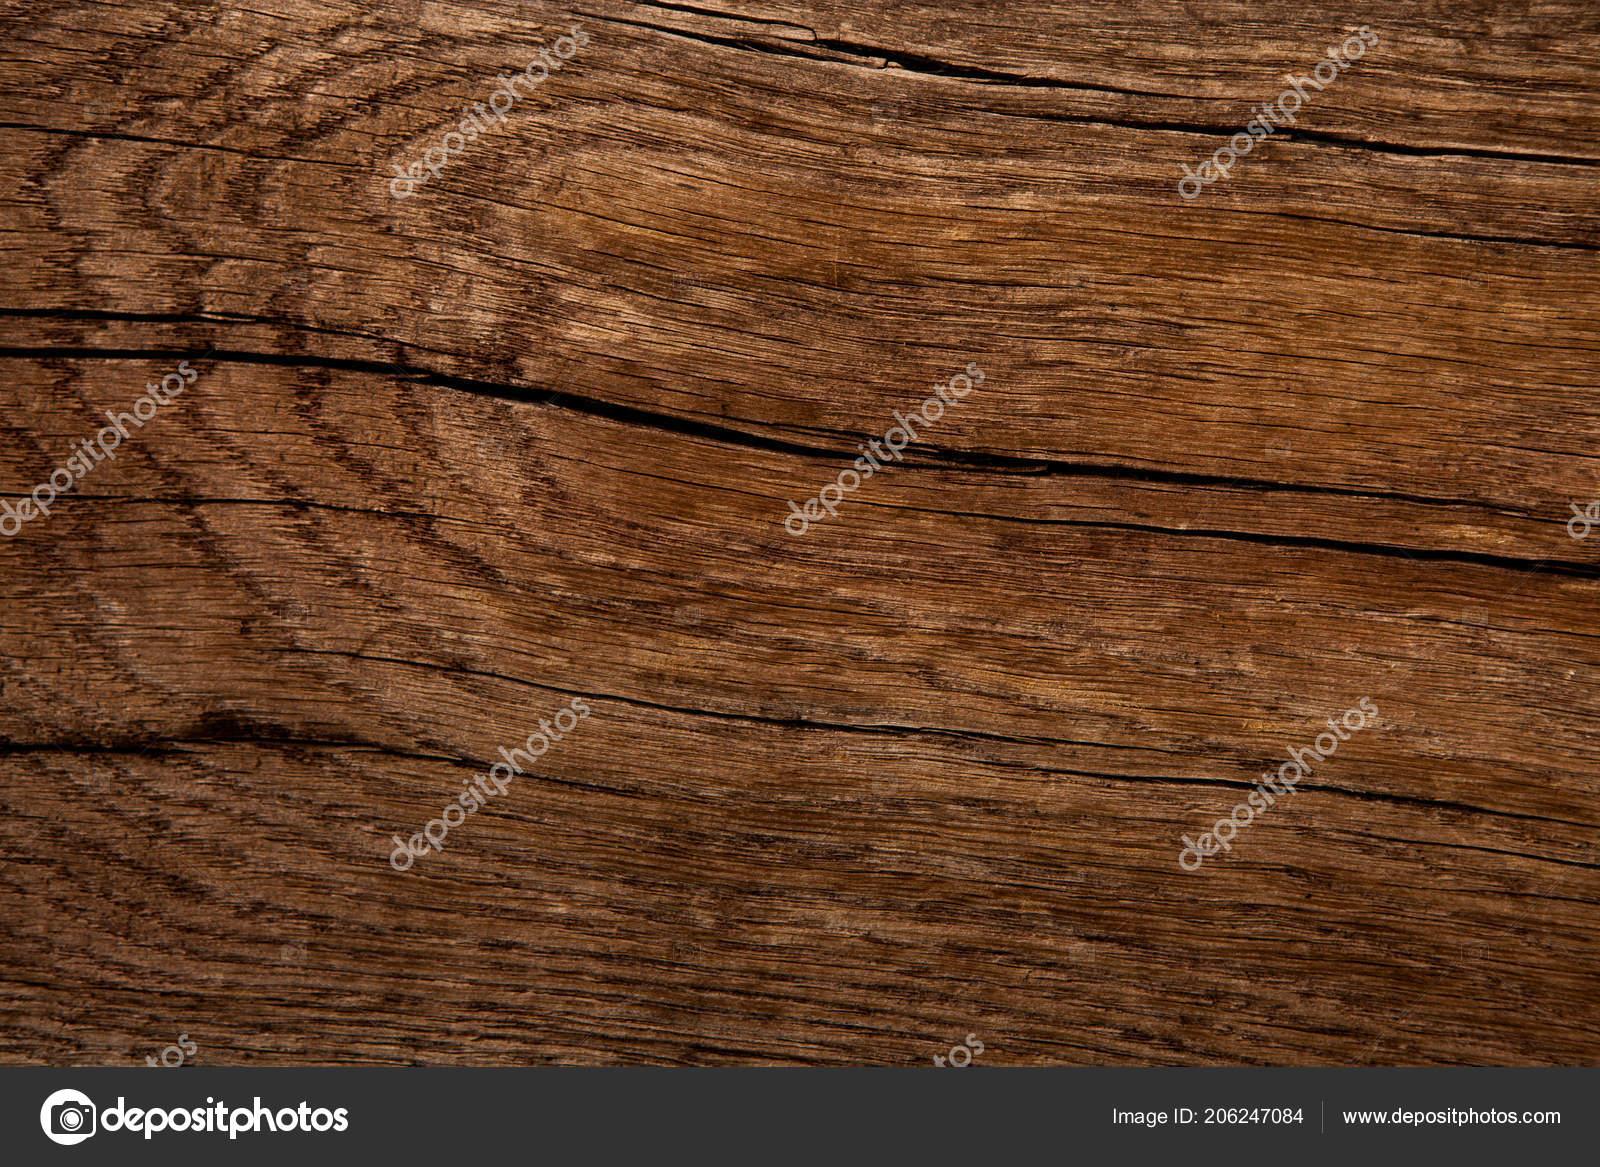 Dark Hardwood Texture With Dark Wooden Texture Wood Brown Background Old Panels Retro u2014 Stock Photo